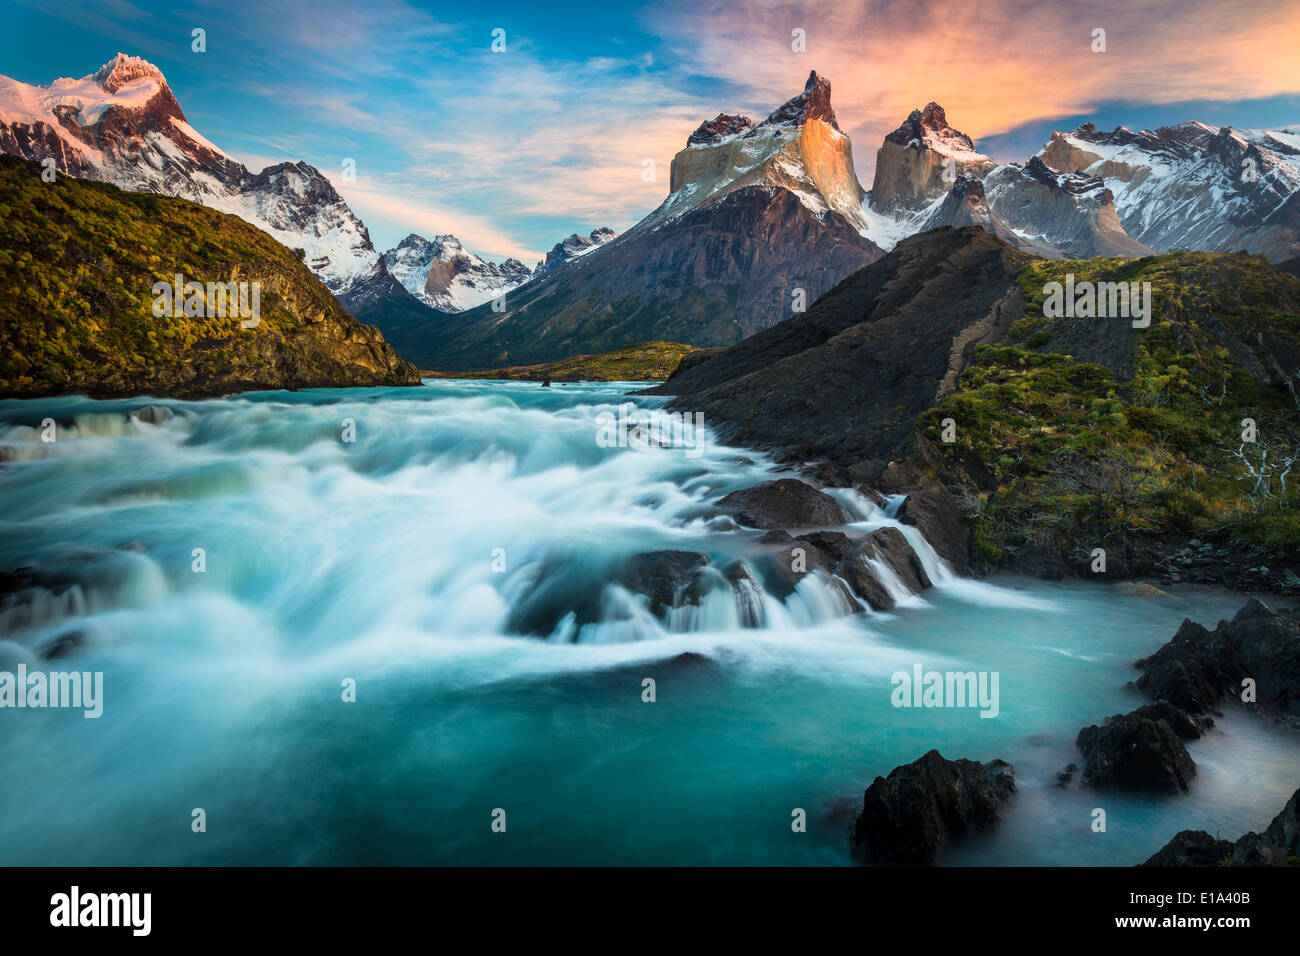 Los Cuernos towering above Salto Grande and Lago Nordenskjold, Torres del Paine, Chilean Patagonia. - Stock Image